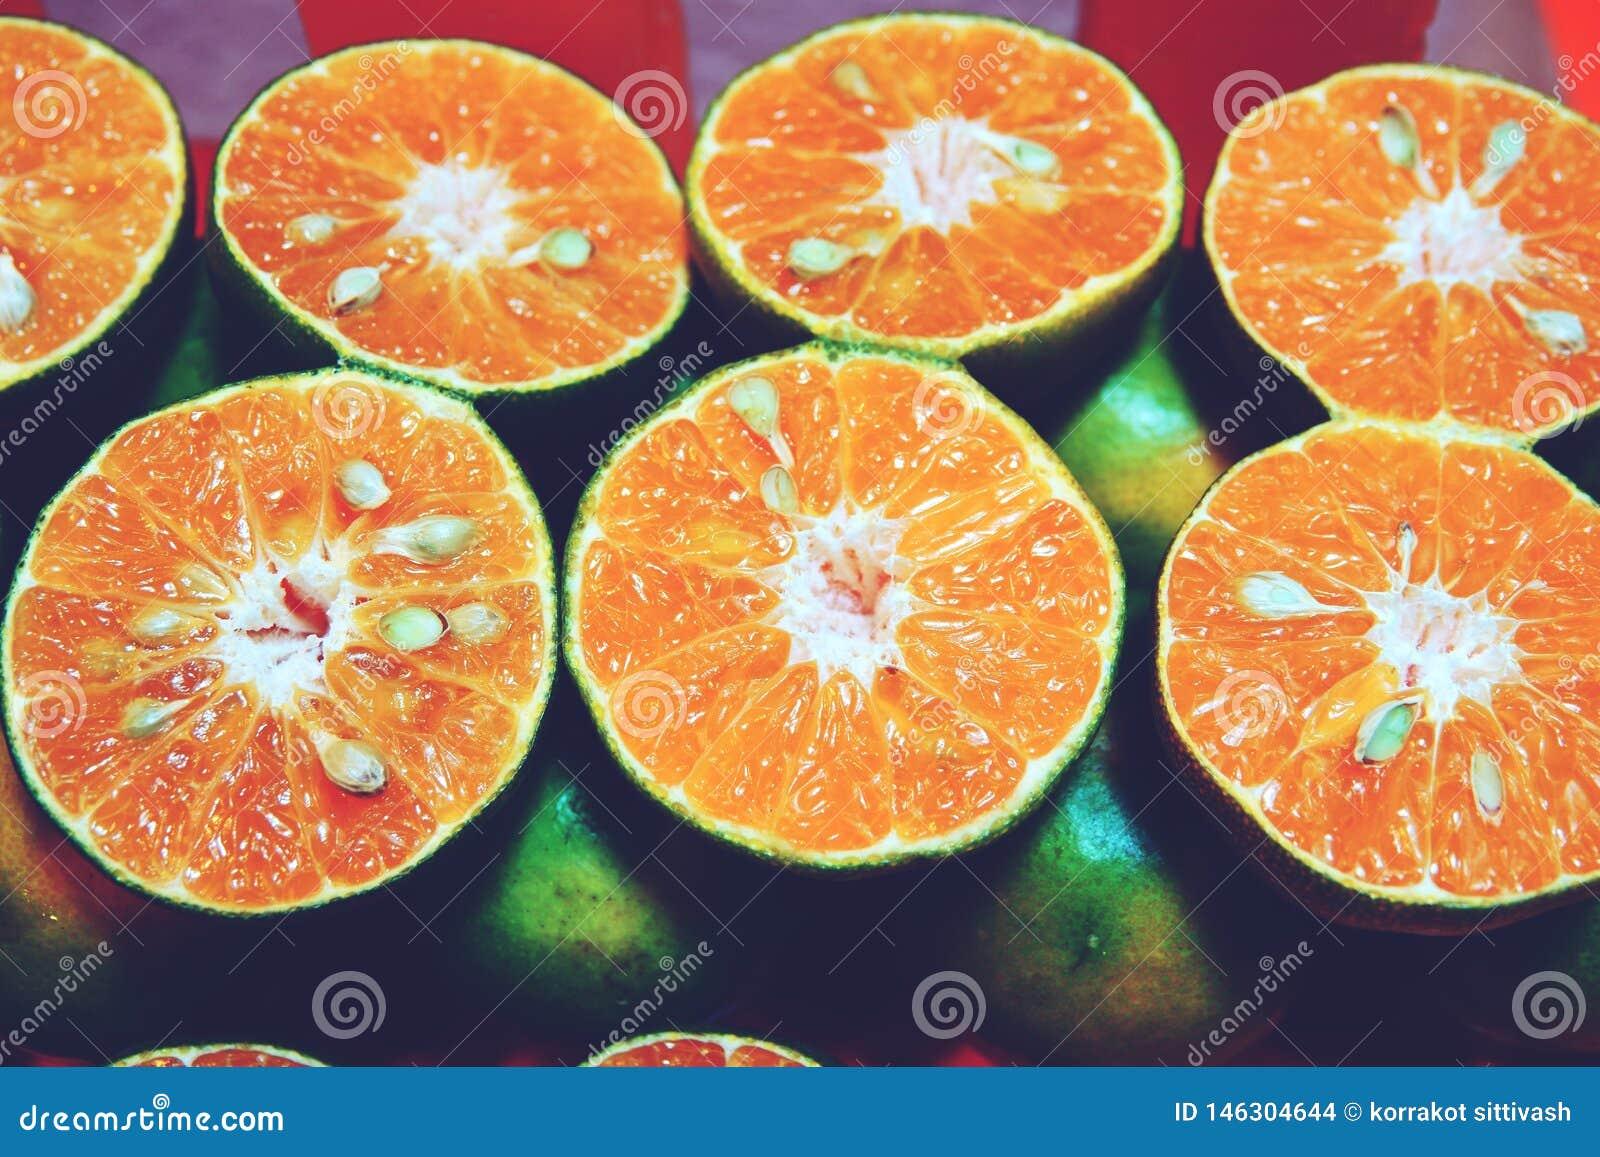 Closeup of cut oranges on a market